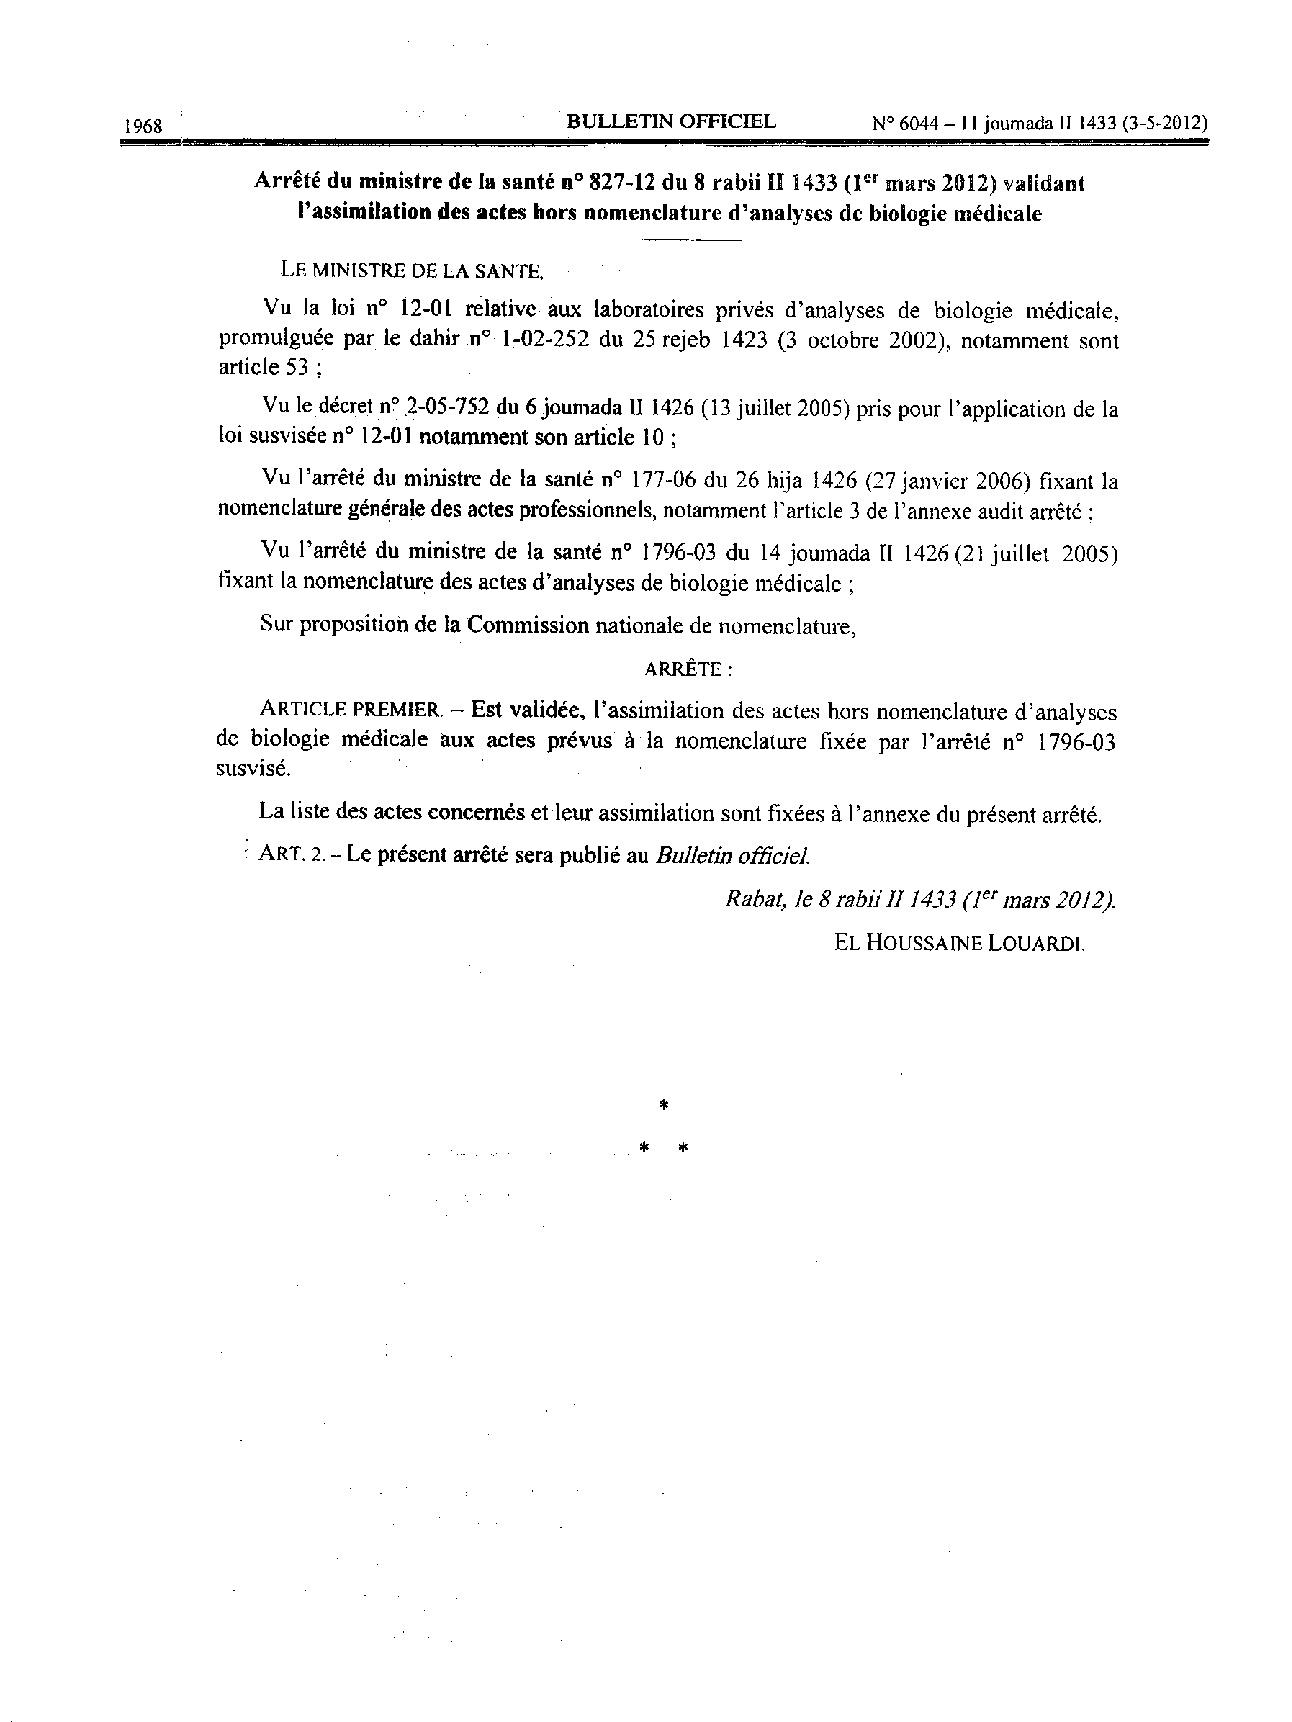 Assimilation-actes-de-biologie-medicale-001